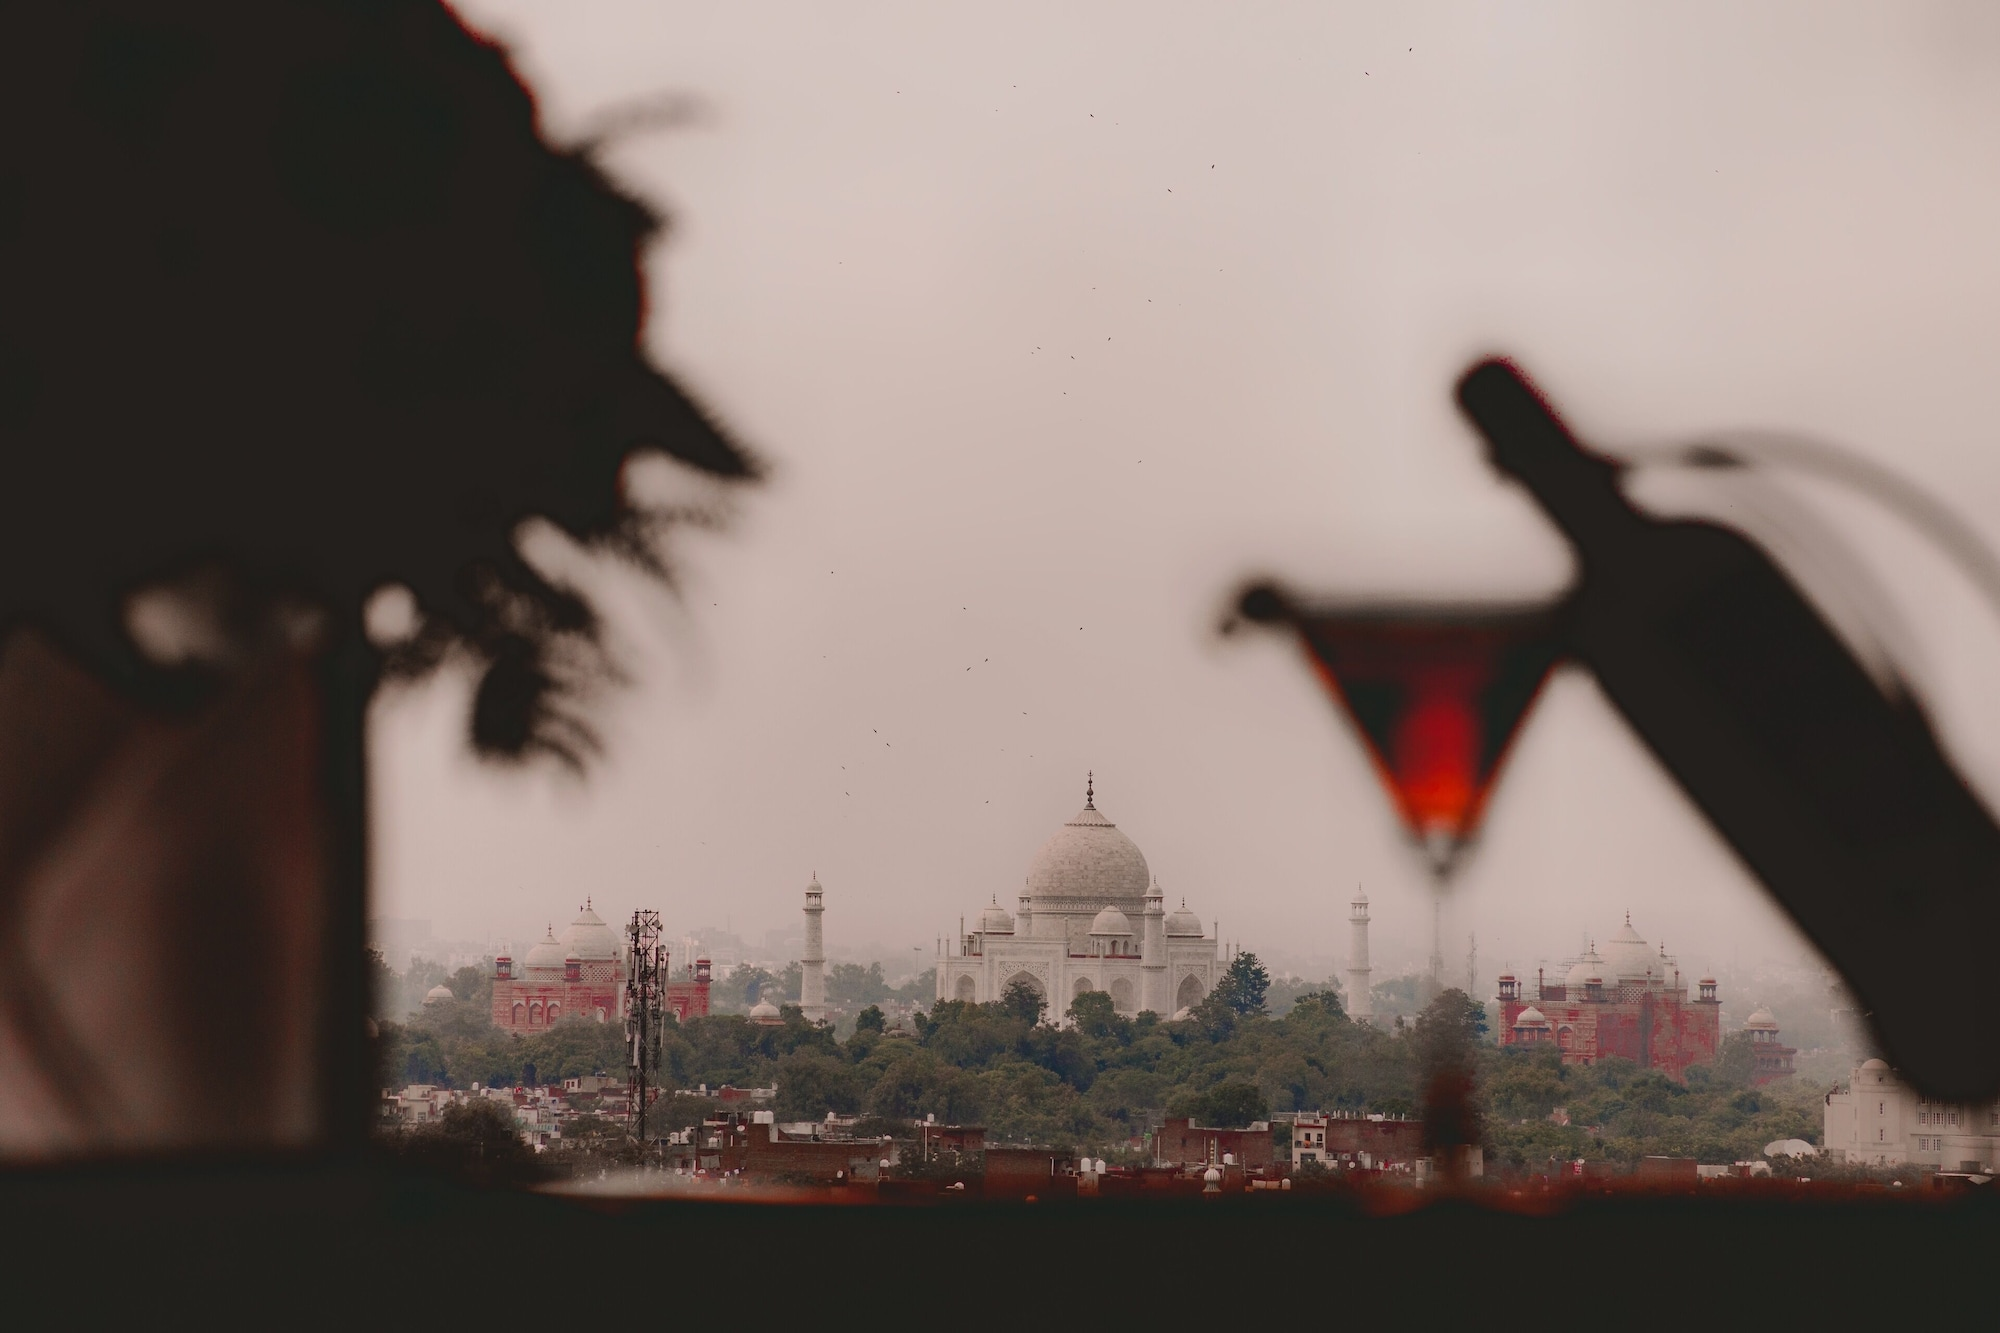 Radisson Hotel Agra, Agra